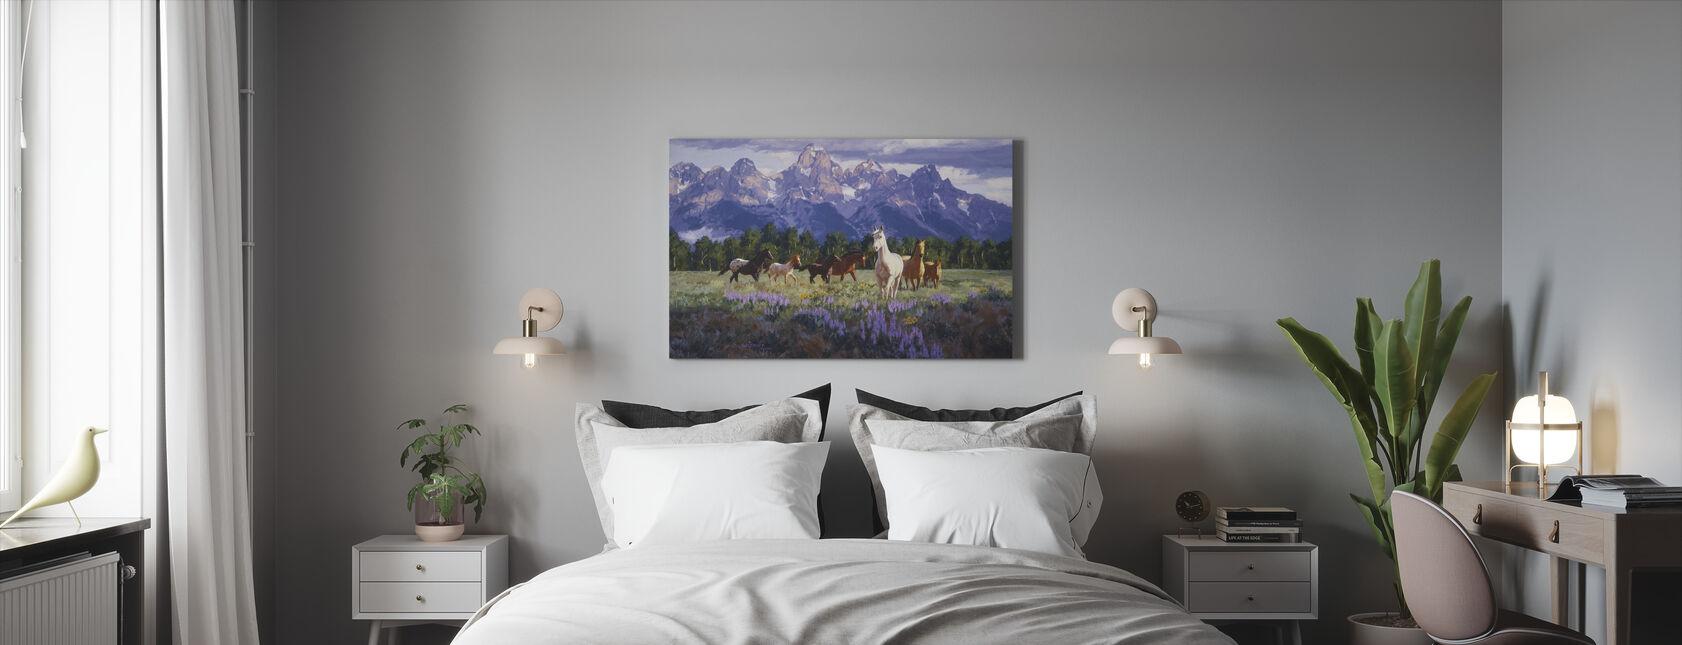 Morning Fresh - Canvas print - Bedroom